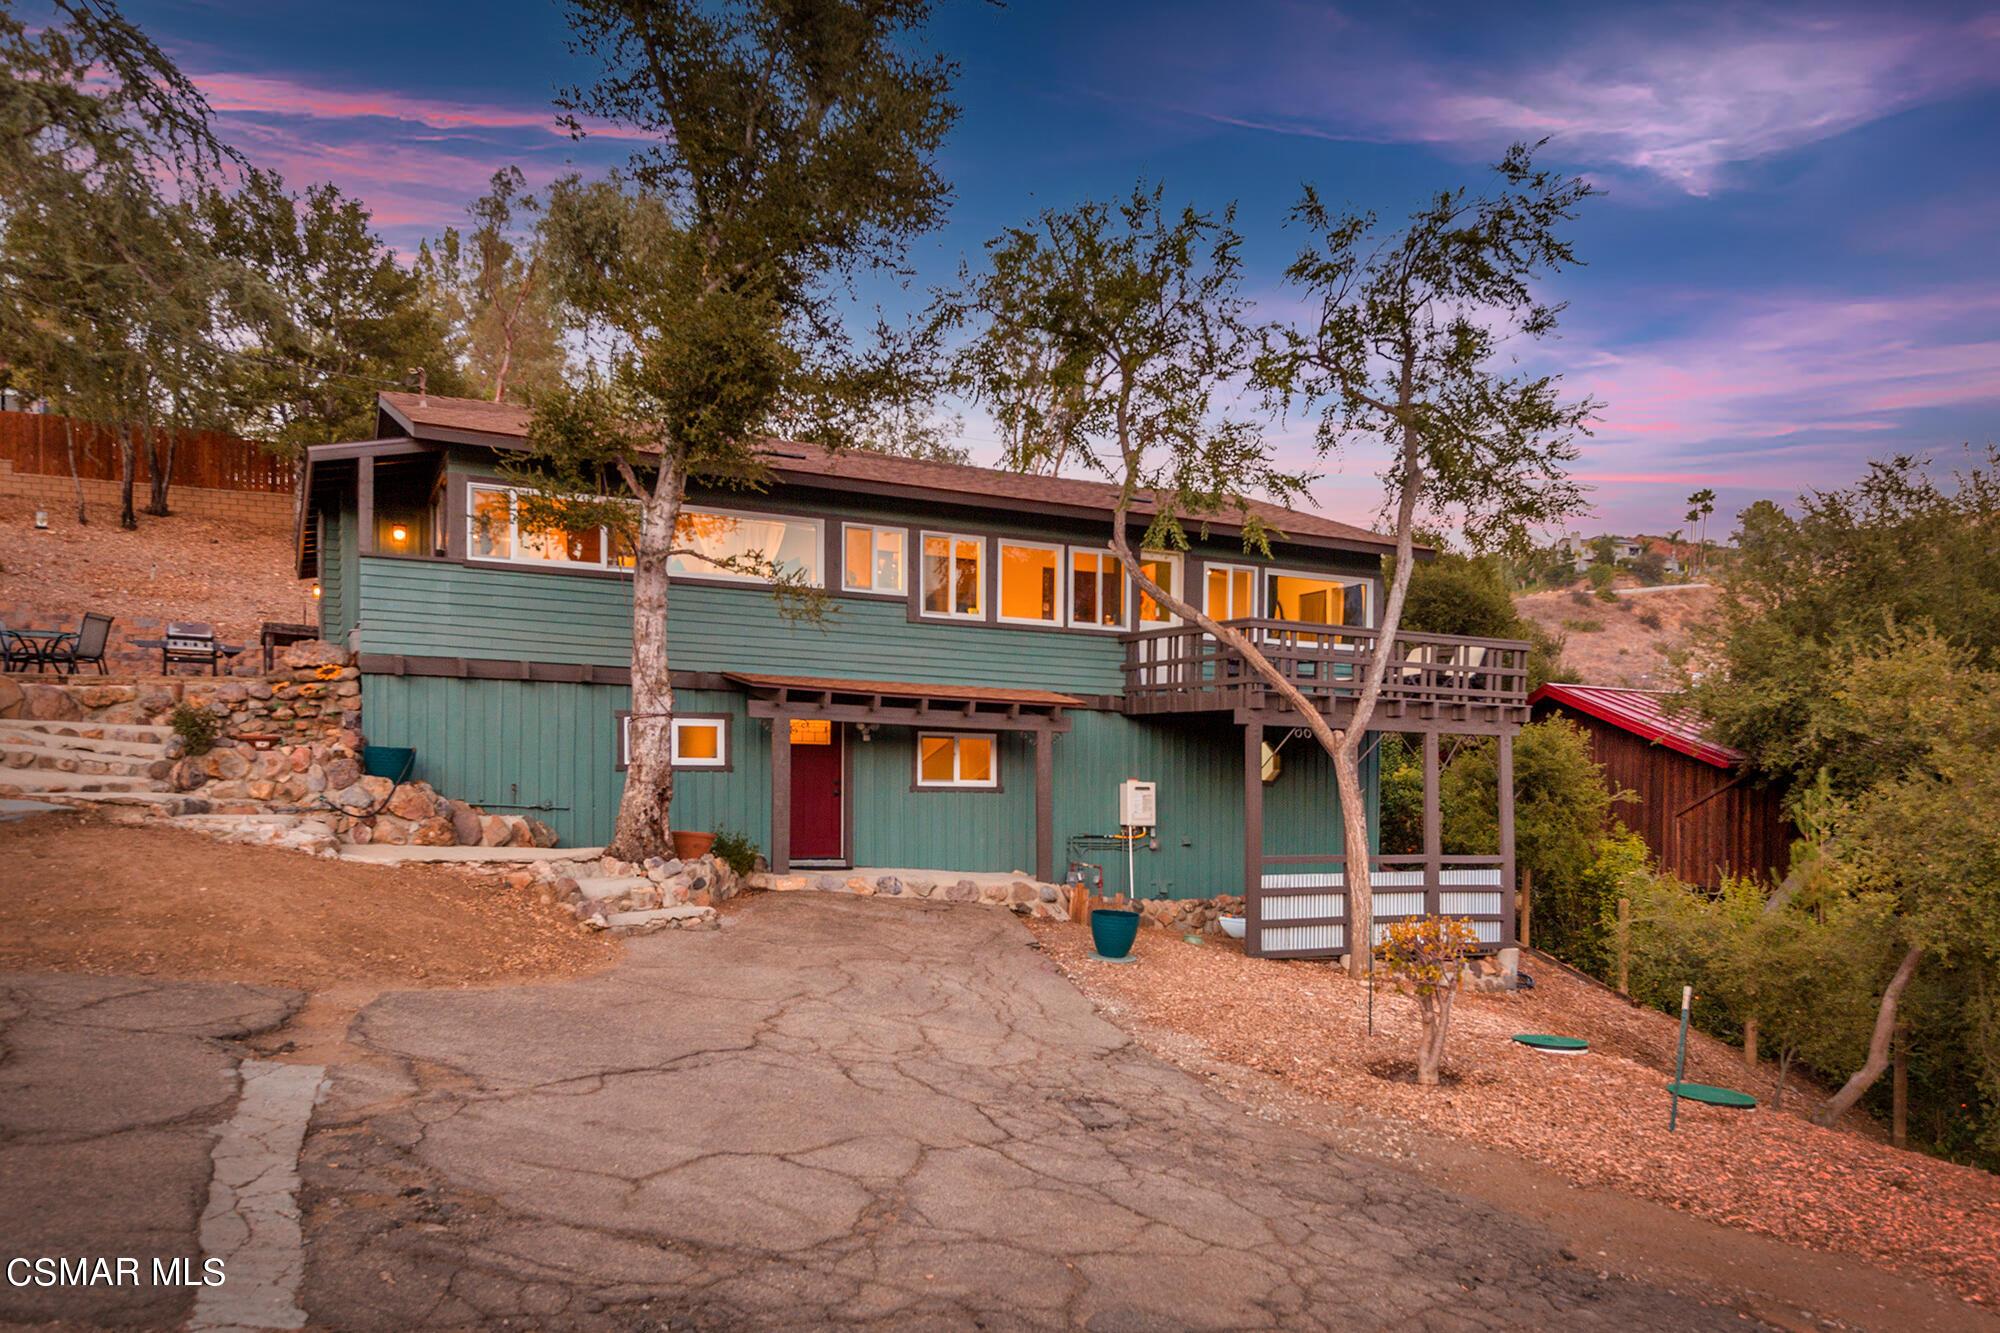 Photo of 2375 Laguna Circle, Agoura Hills, CA 91301